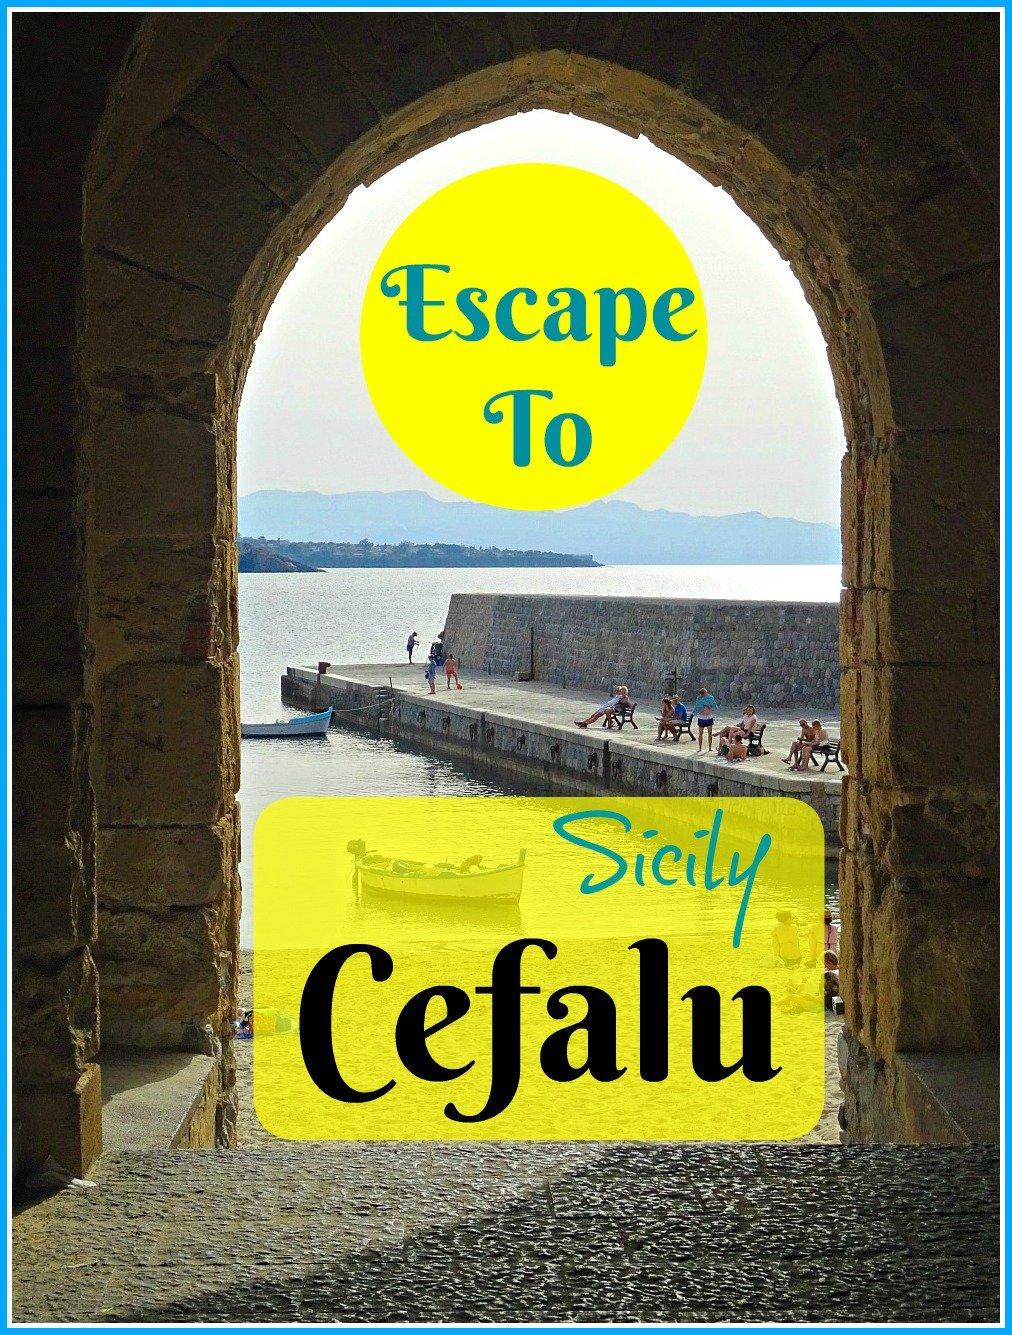 Archway Cefalu Sicily